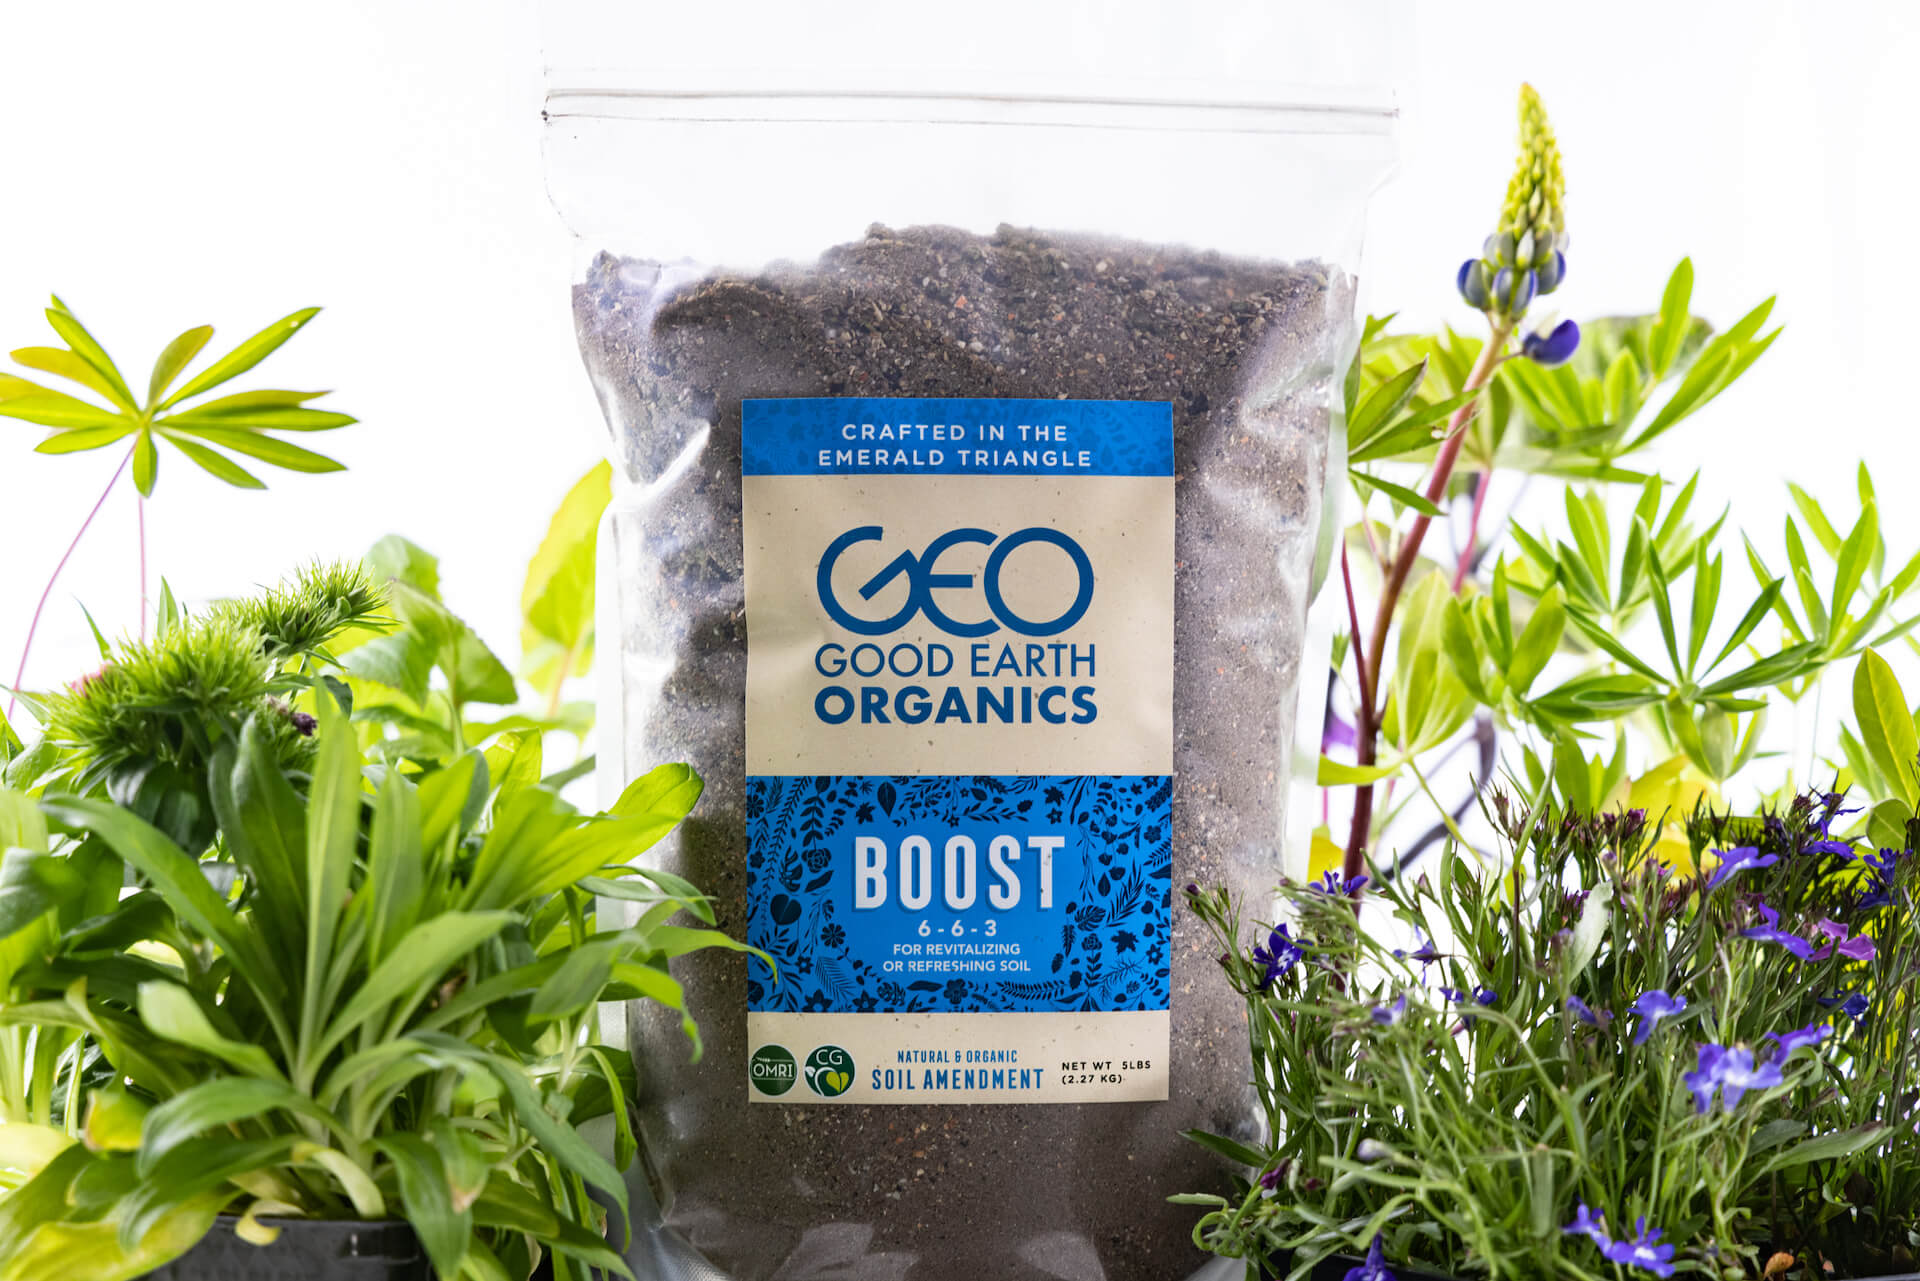 Good Earth Organics Boost Soil Amendment for Your Cannabis Garden - My Personal Plats